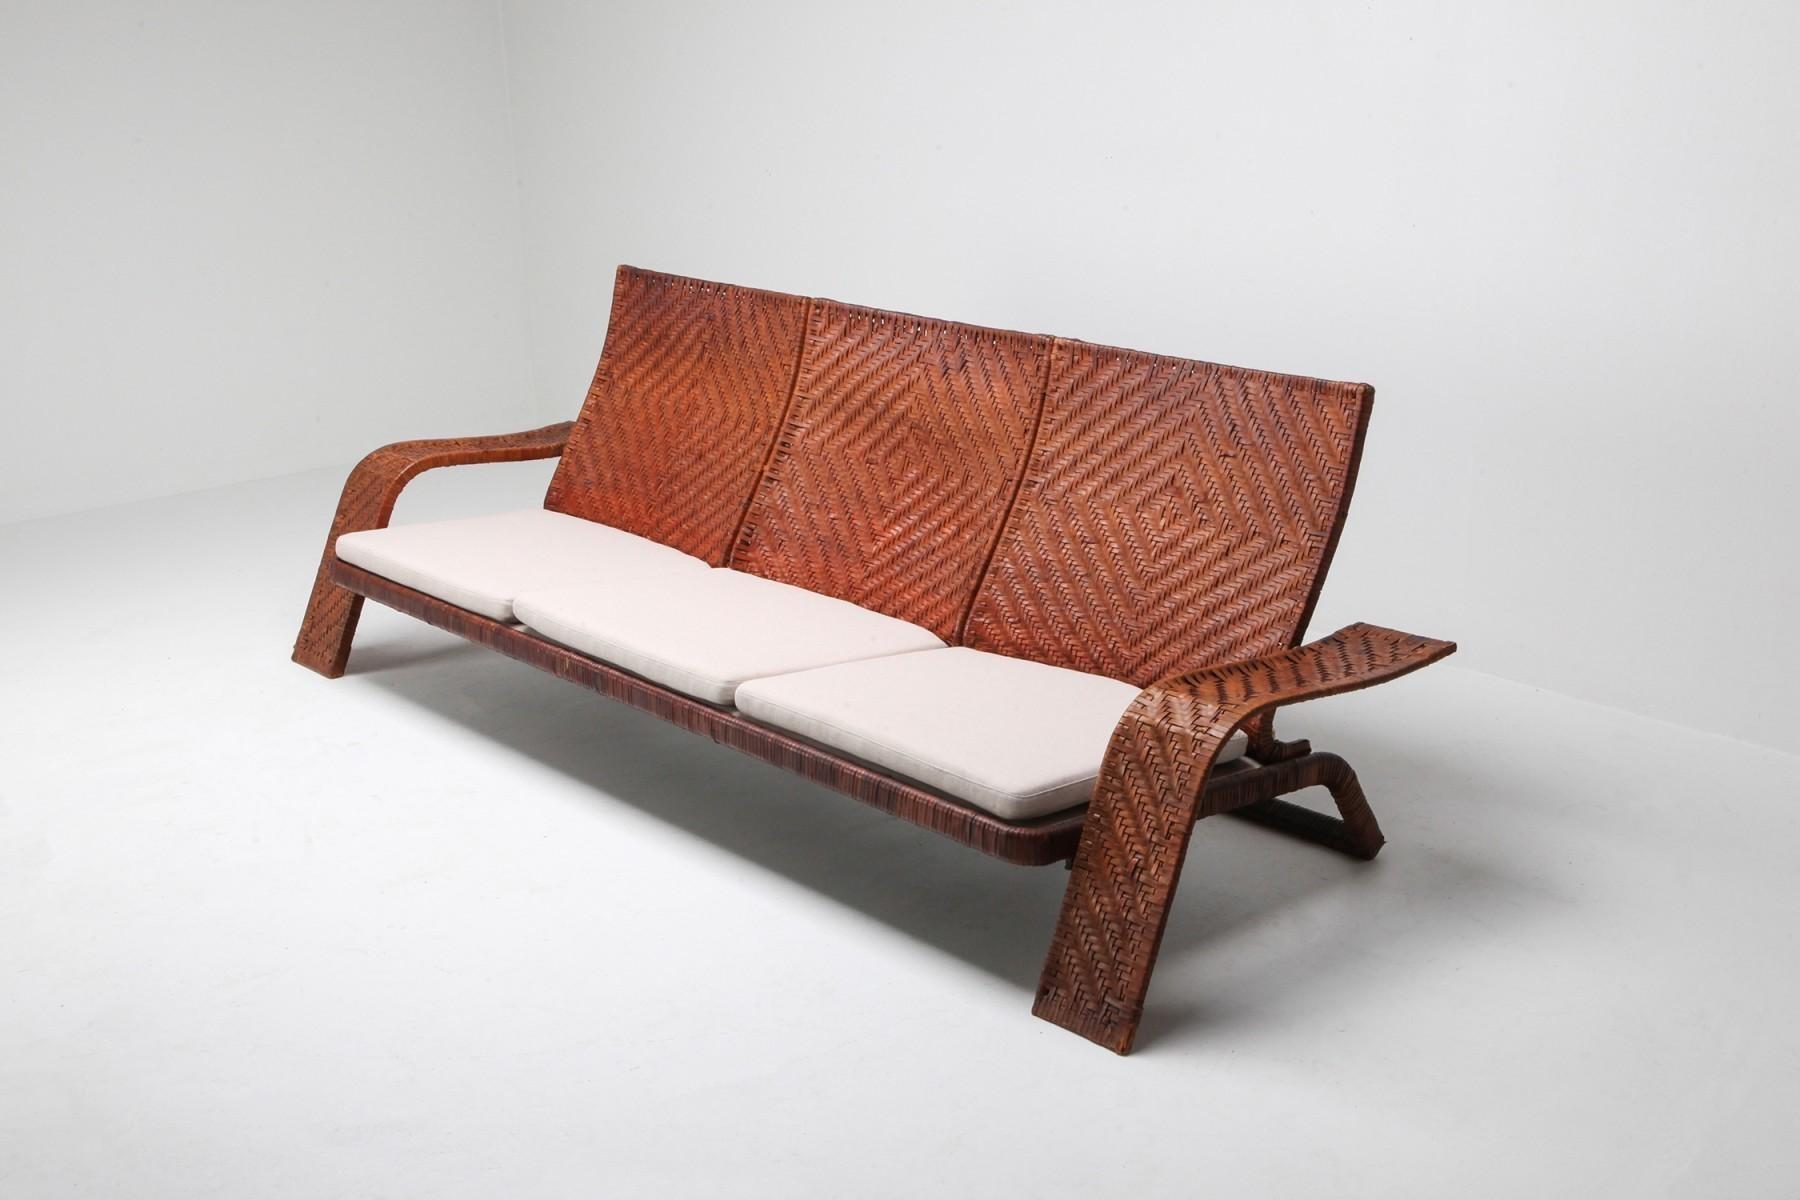 Marzio C Woven Leather Postmodern Sofa